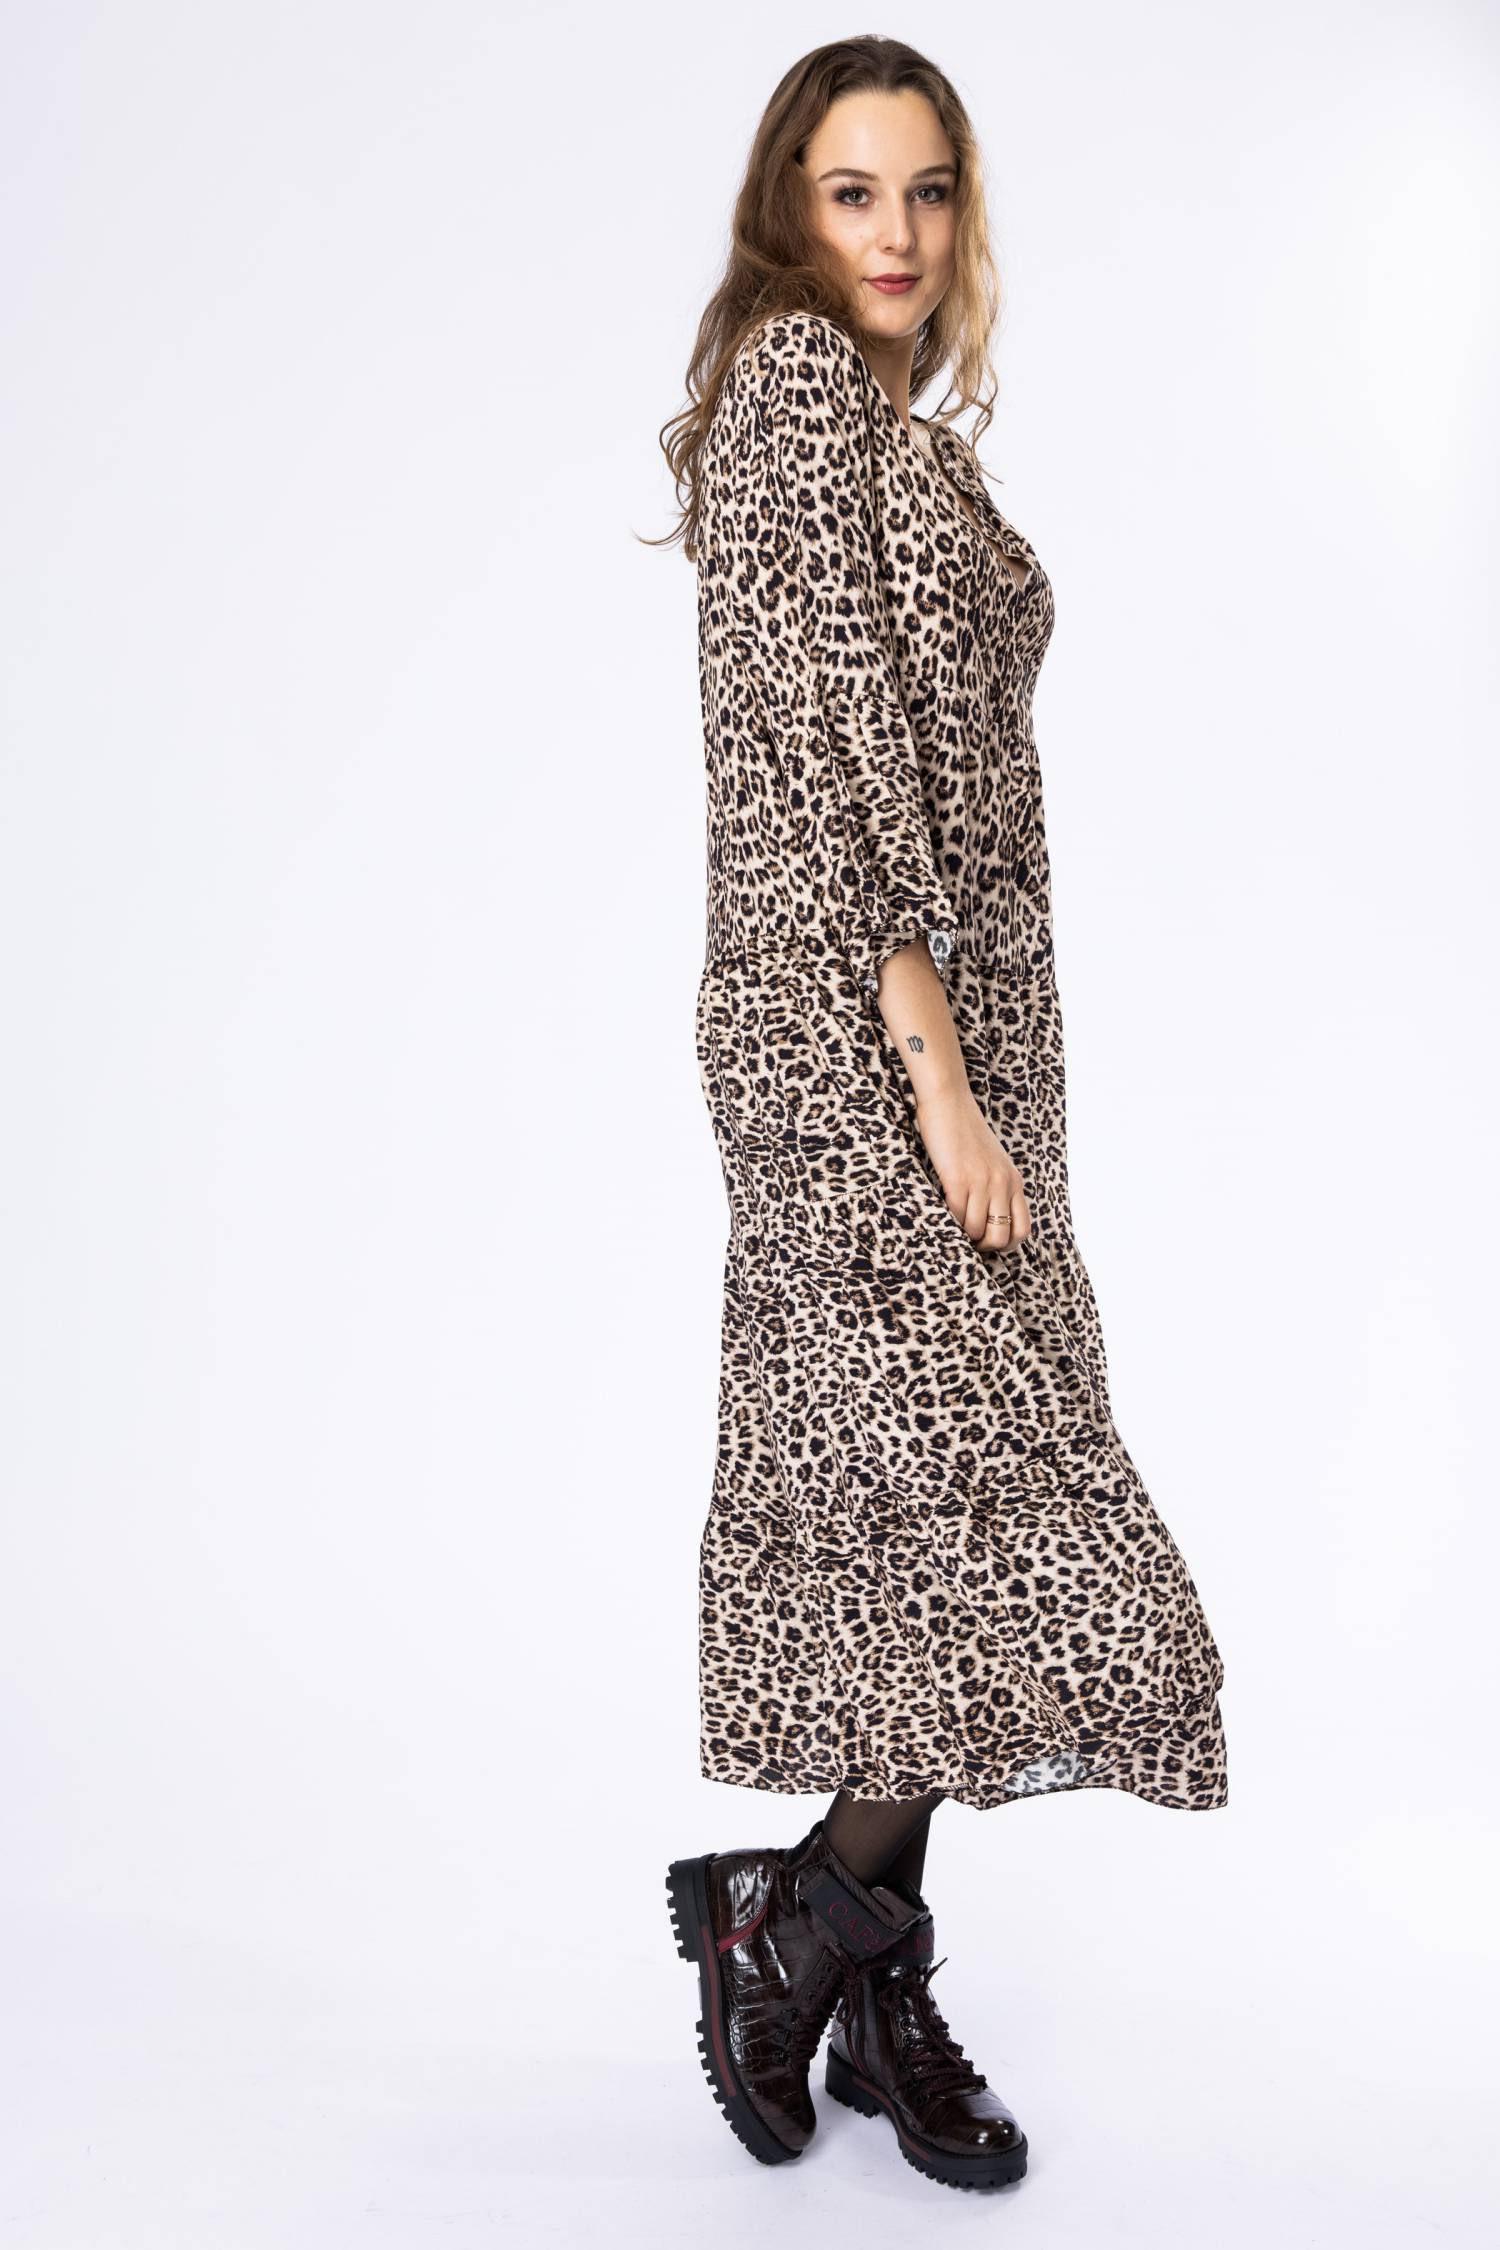 Gestuftes Maxi Kleid Im Zarten Leoprint  La Strada